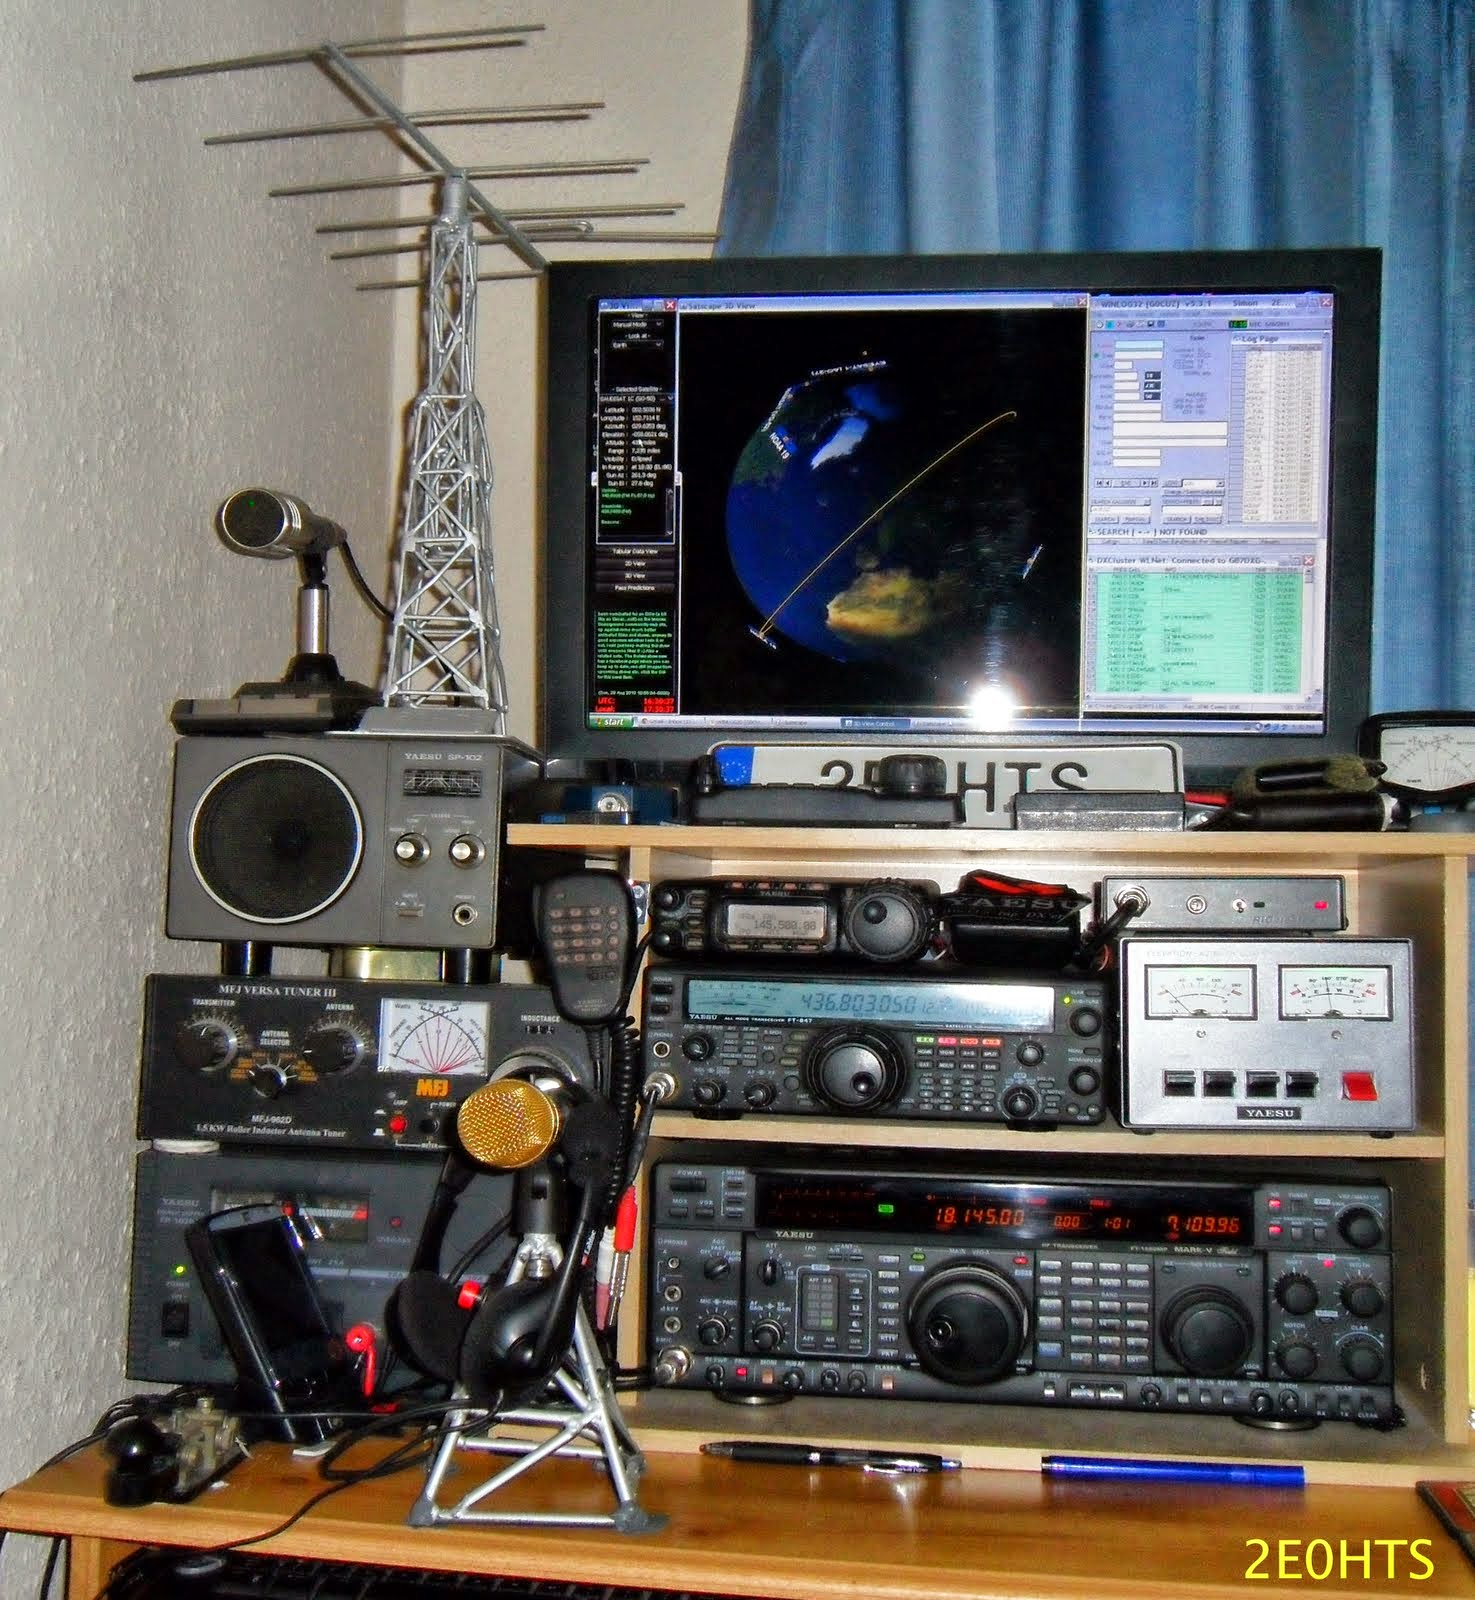 Amateur Radio Station Wb4omm: Ham Radio: Ham Radio Station Reaches Completion